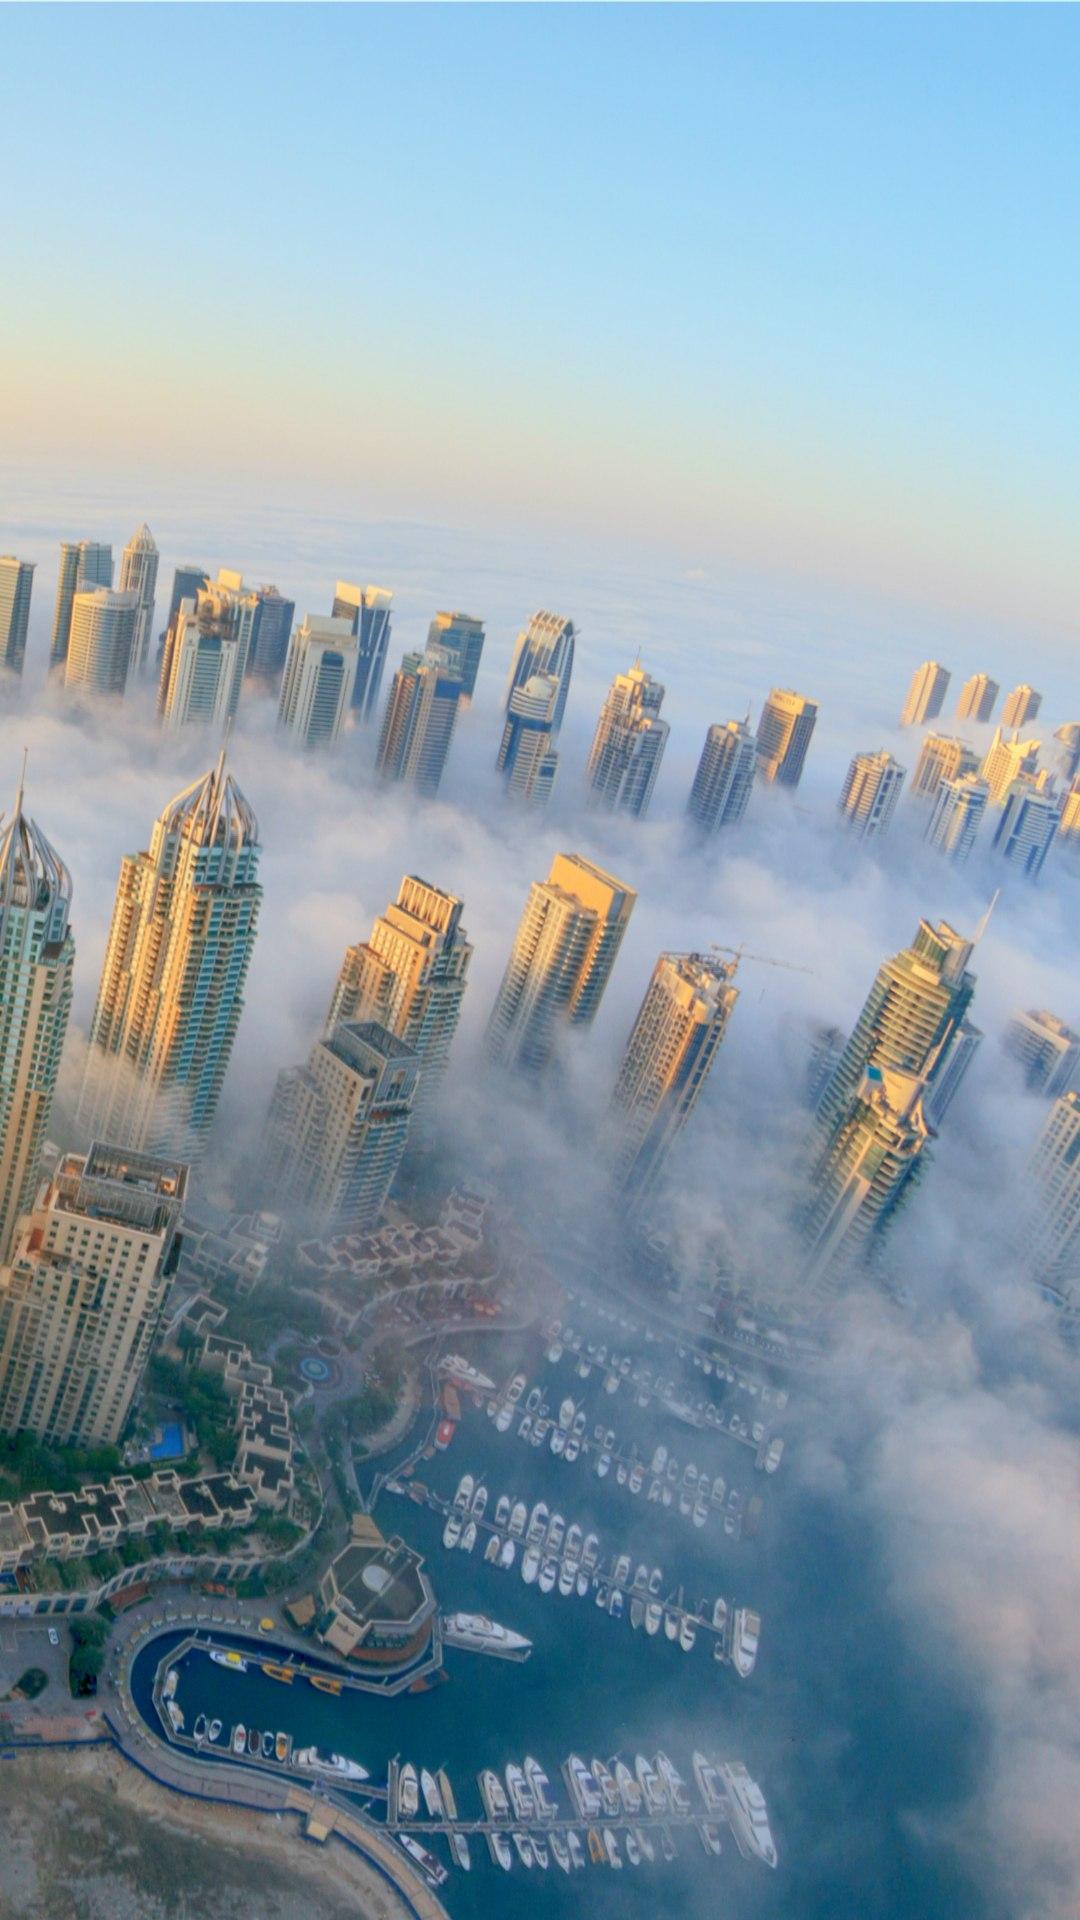 dubai city fog skyscrapers mobile wallpaper